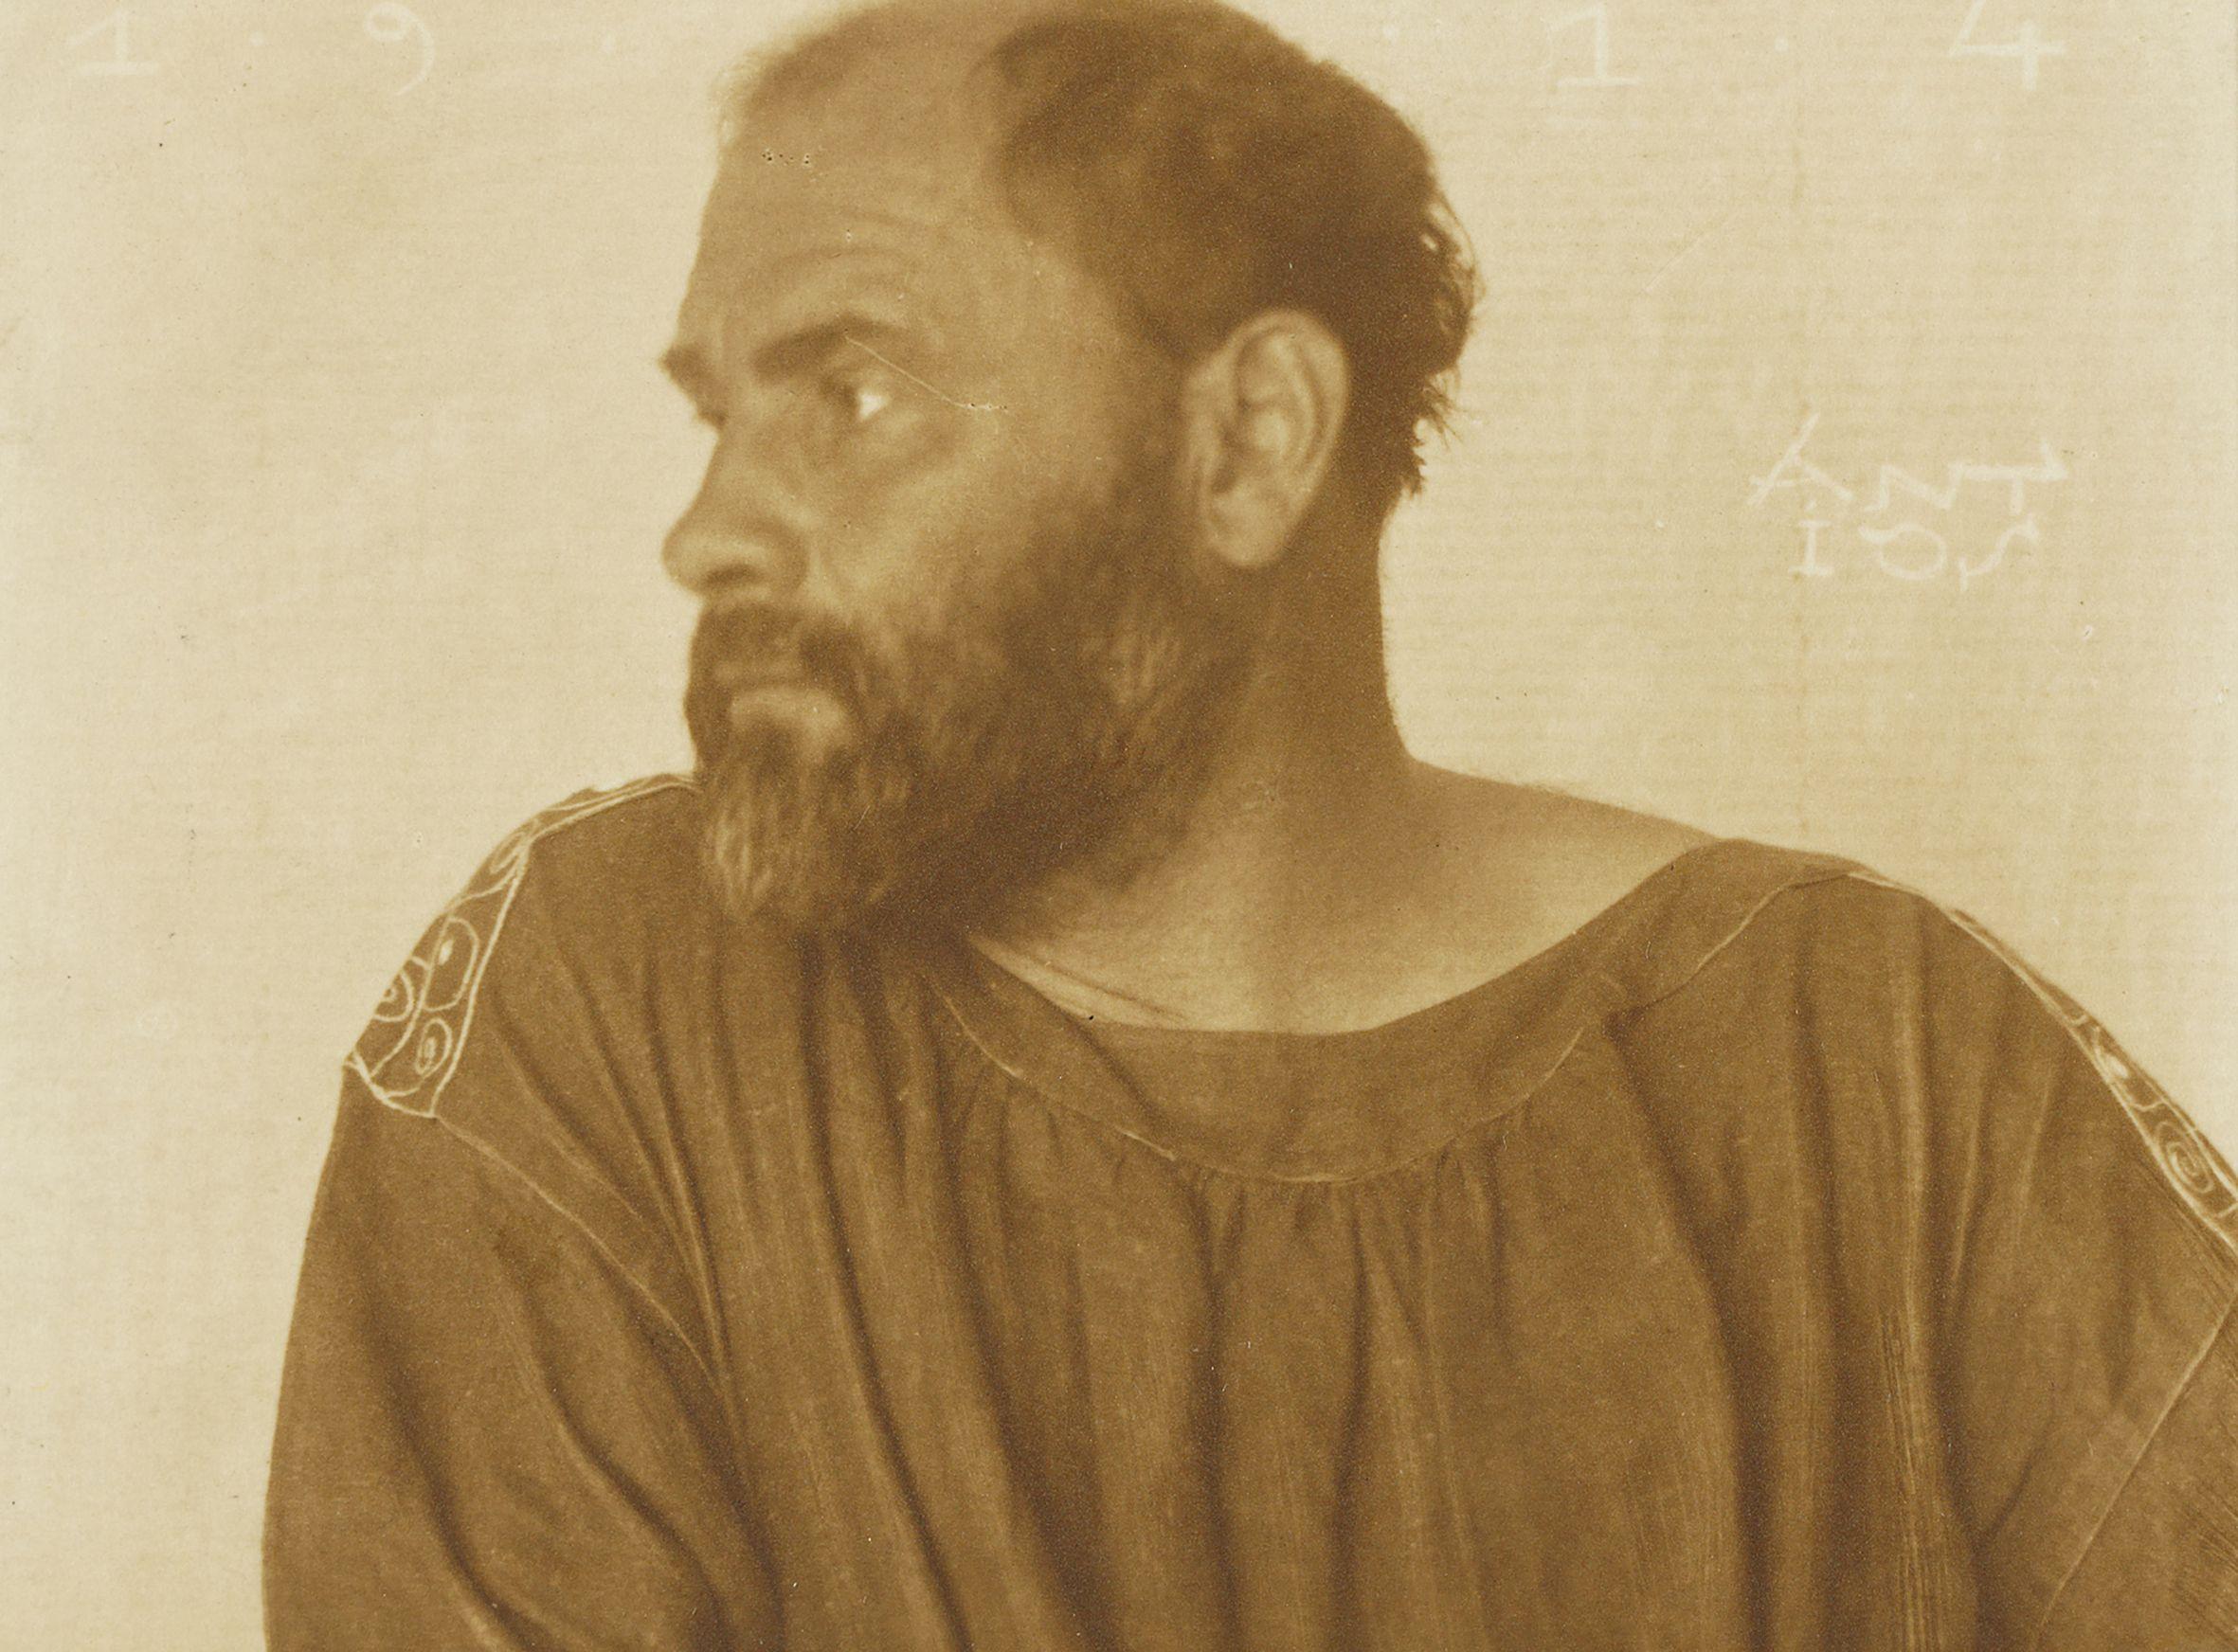 Gustav Klimt by Josef Anton Trcka, 1914